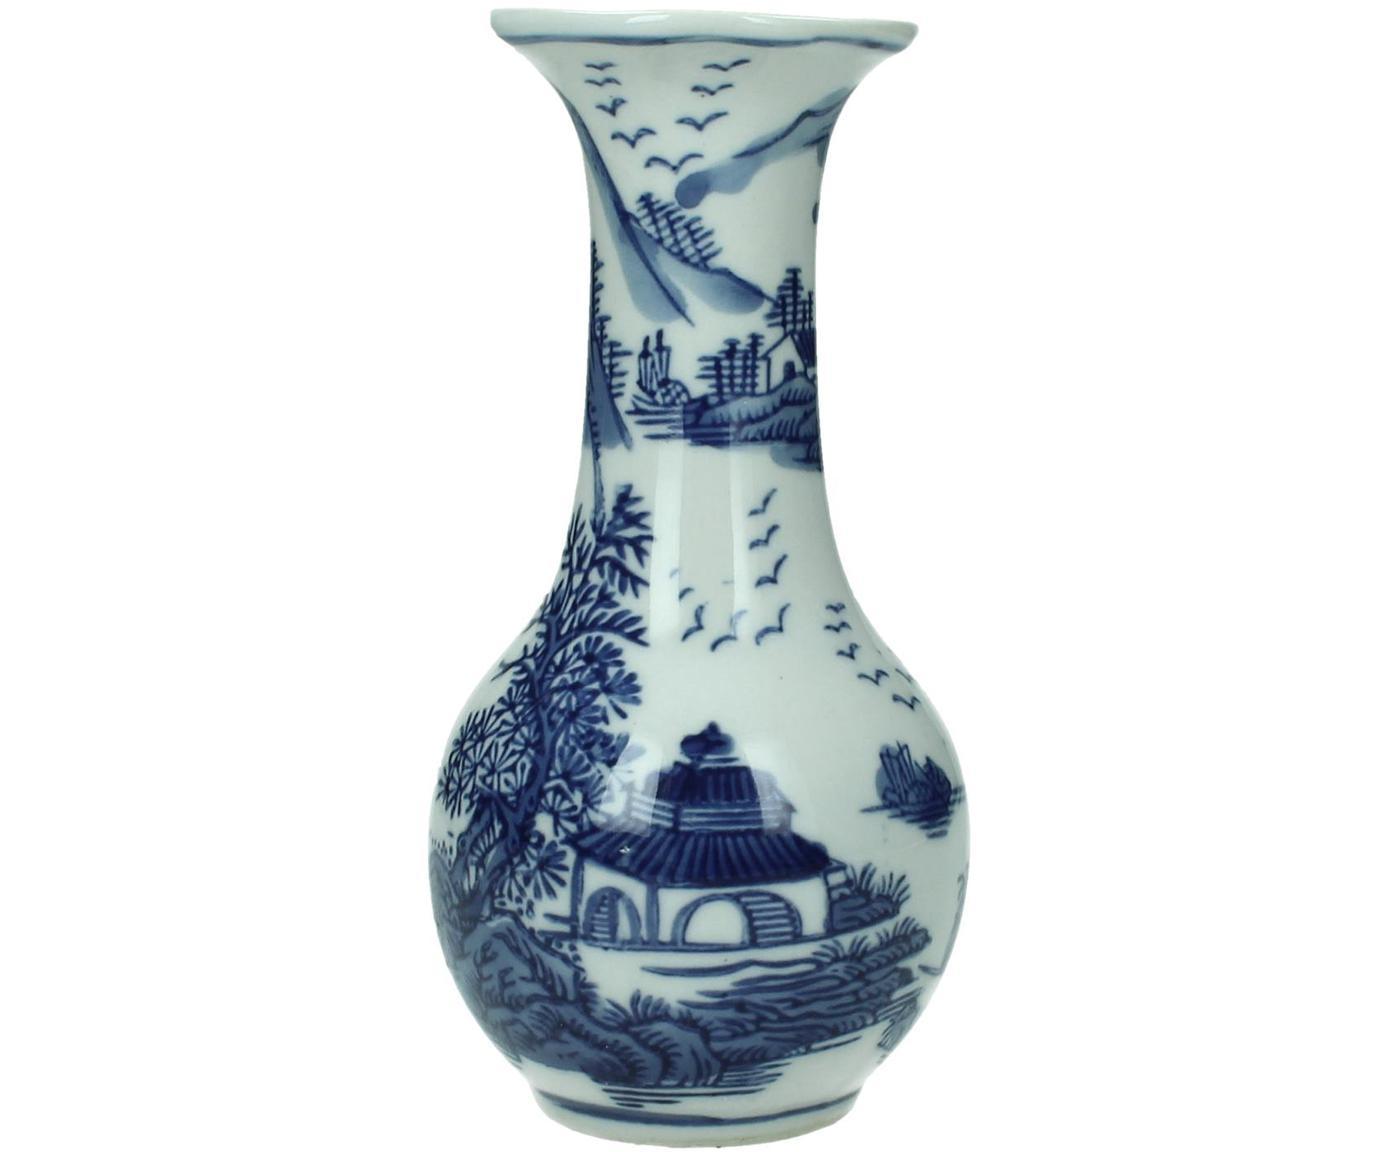 Keramik-Vase Minno, Keramik, Gebrochenes Weiß, Blau, Ø 8 x H 15 cm